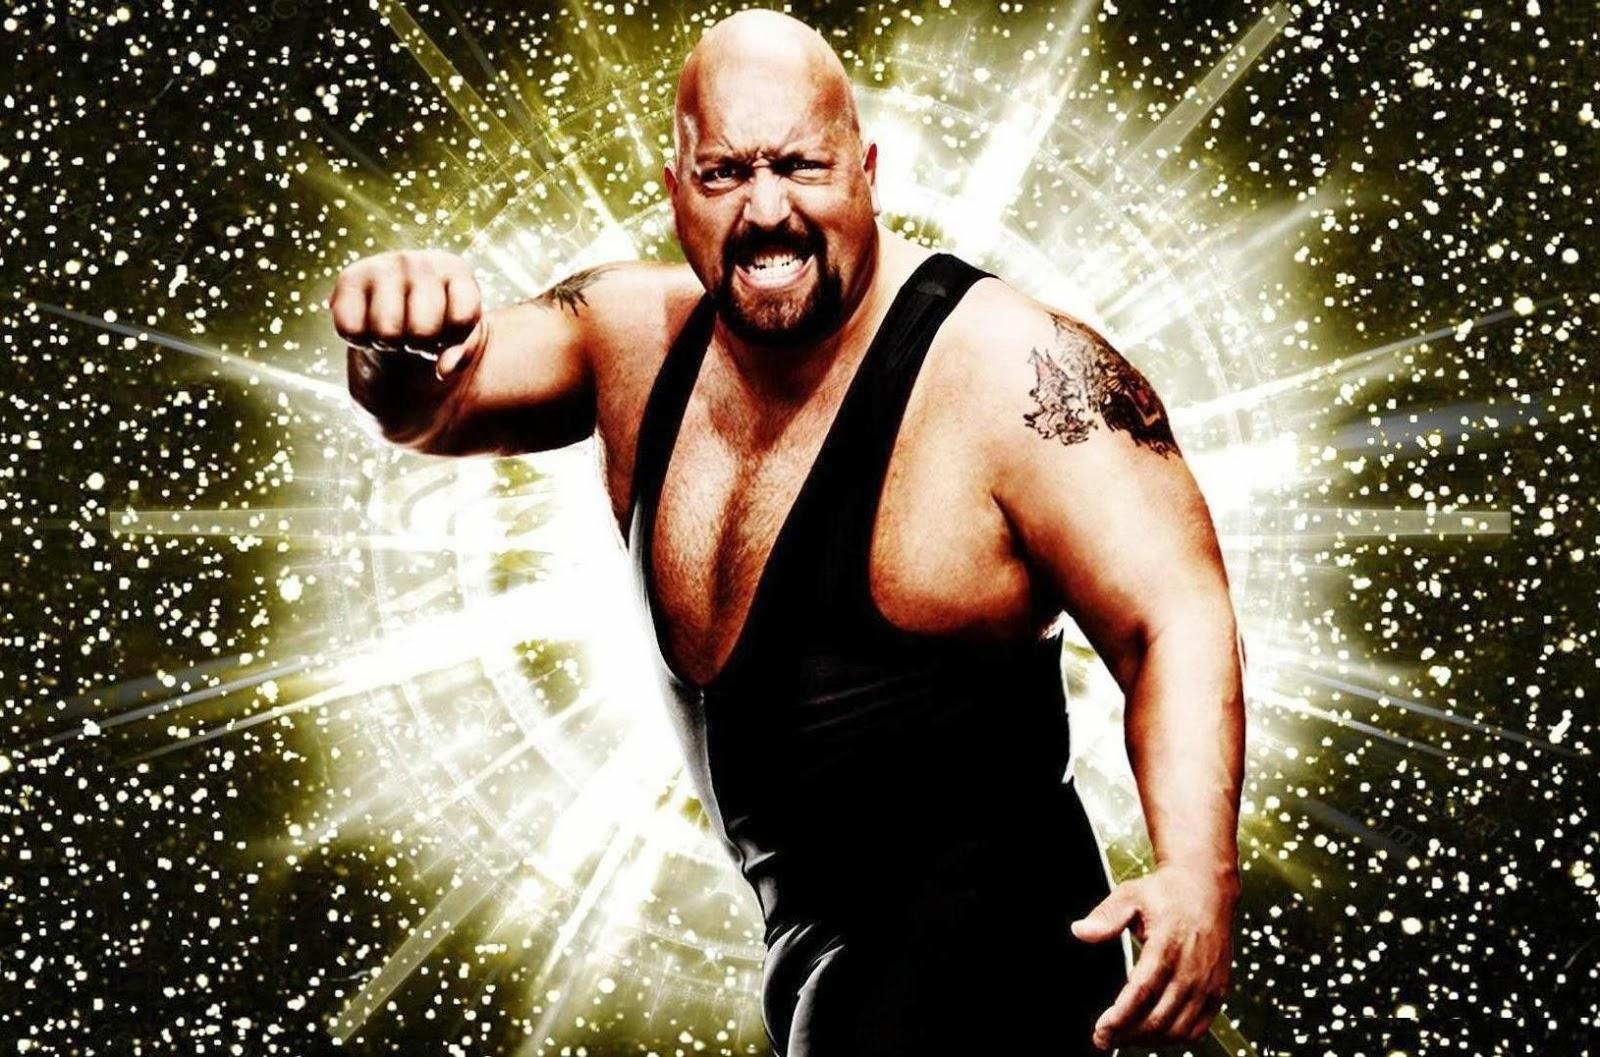 WWE HD WALLPAPER FREE DOWNLOAD